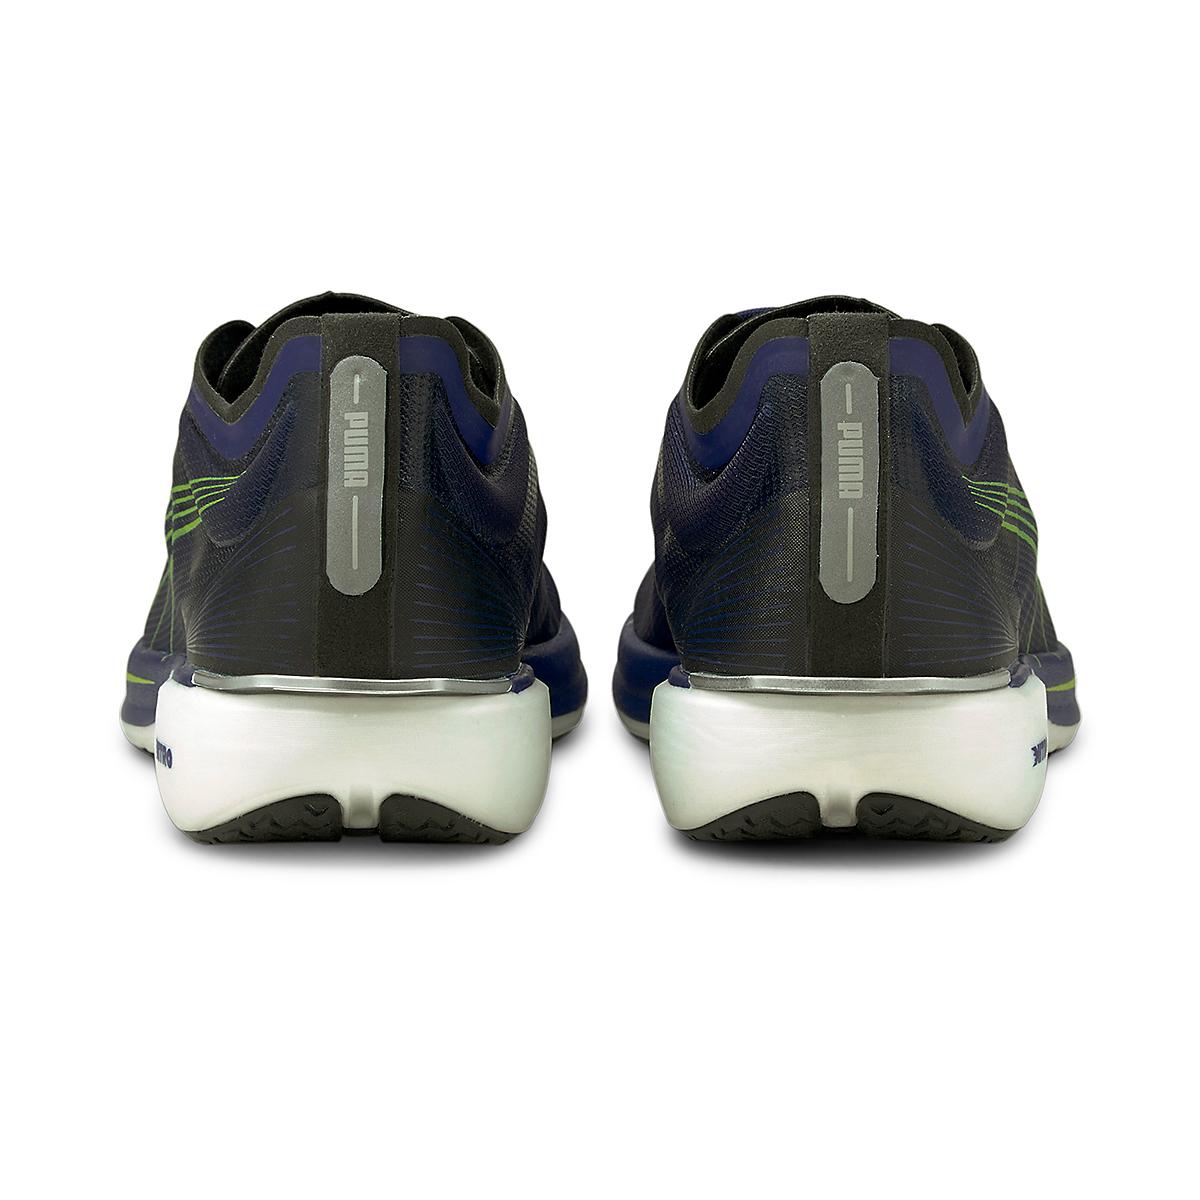 Men's Puma Liberate Nitro Running Shoe - Color: Elektro Blue - Size: 7 - Width: Regular, Elektro Blue, large, image 4